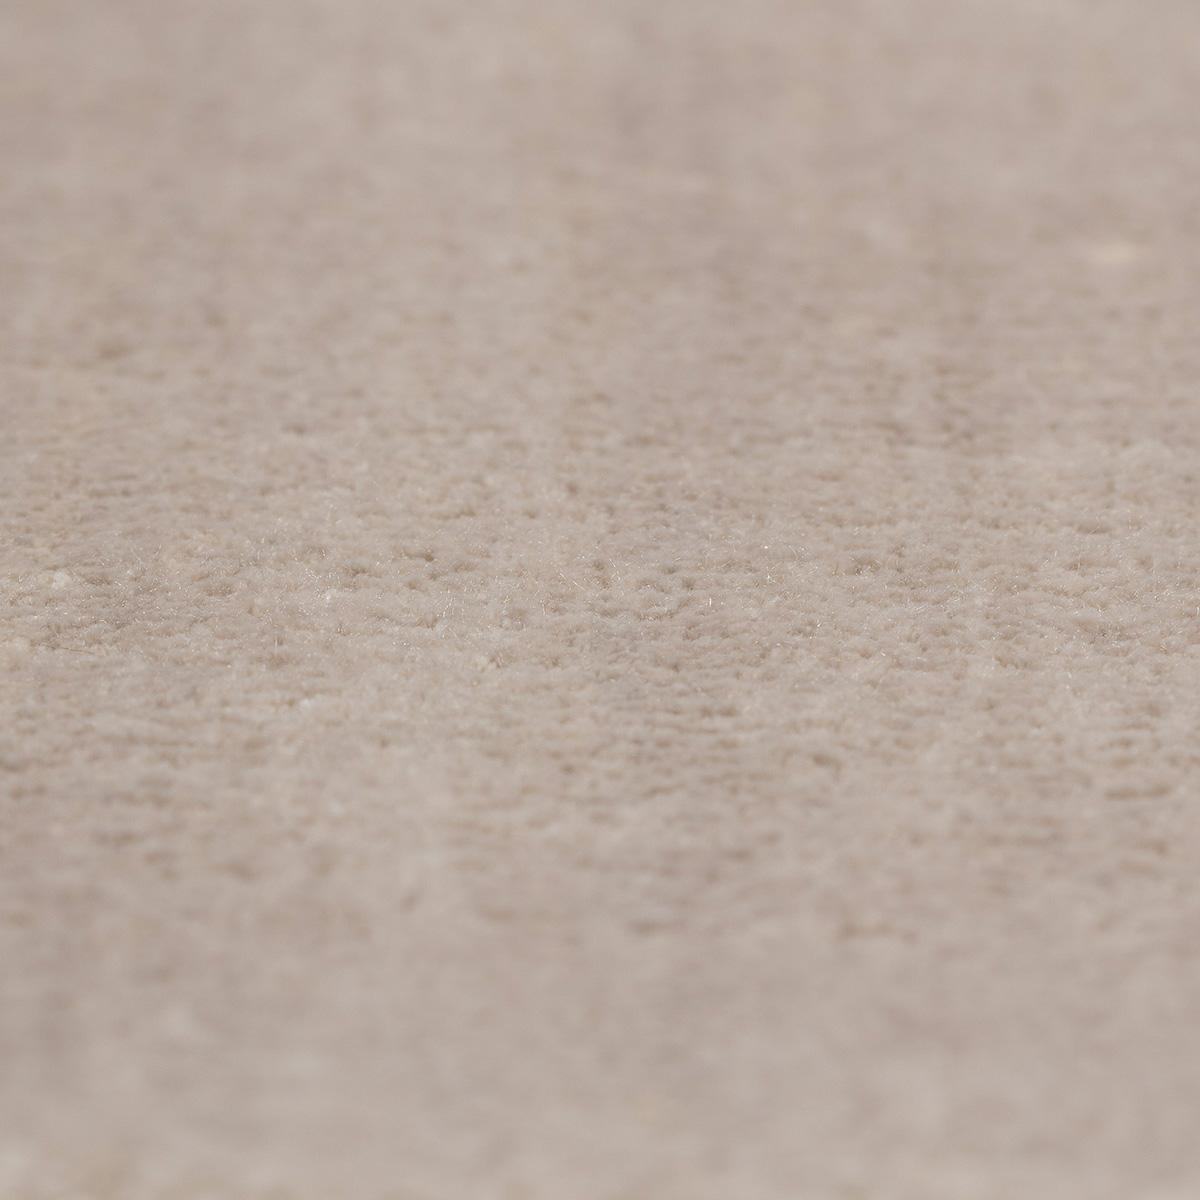 Vloerkleed Brinker Sensation Beige | 200 x 290 cm